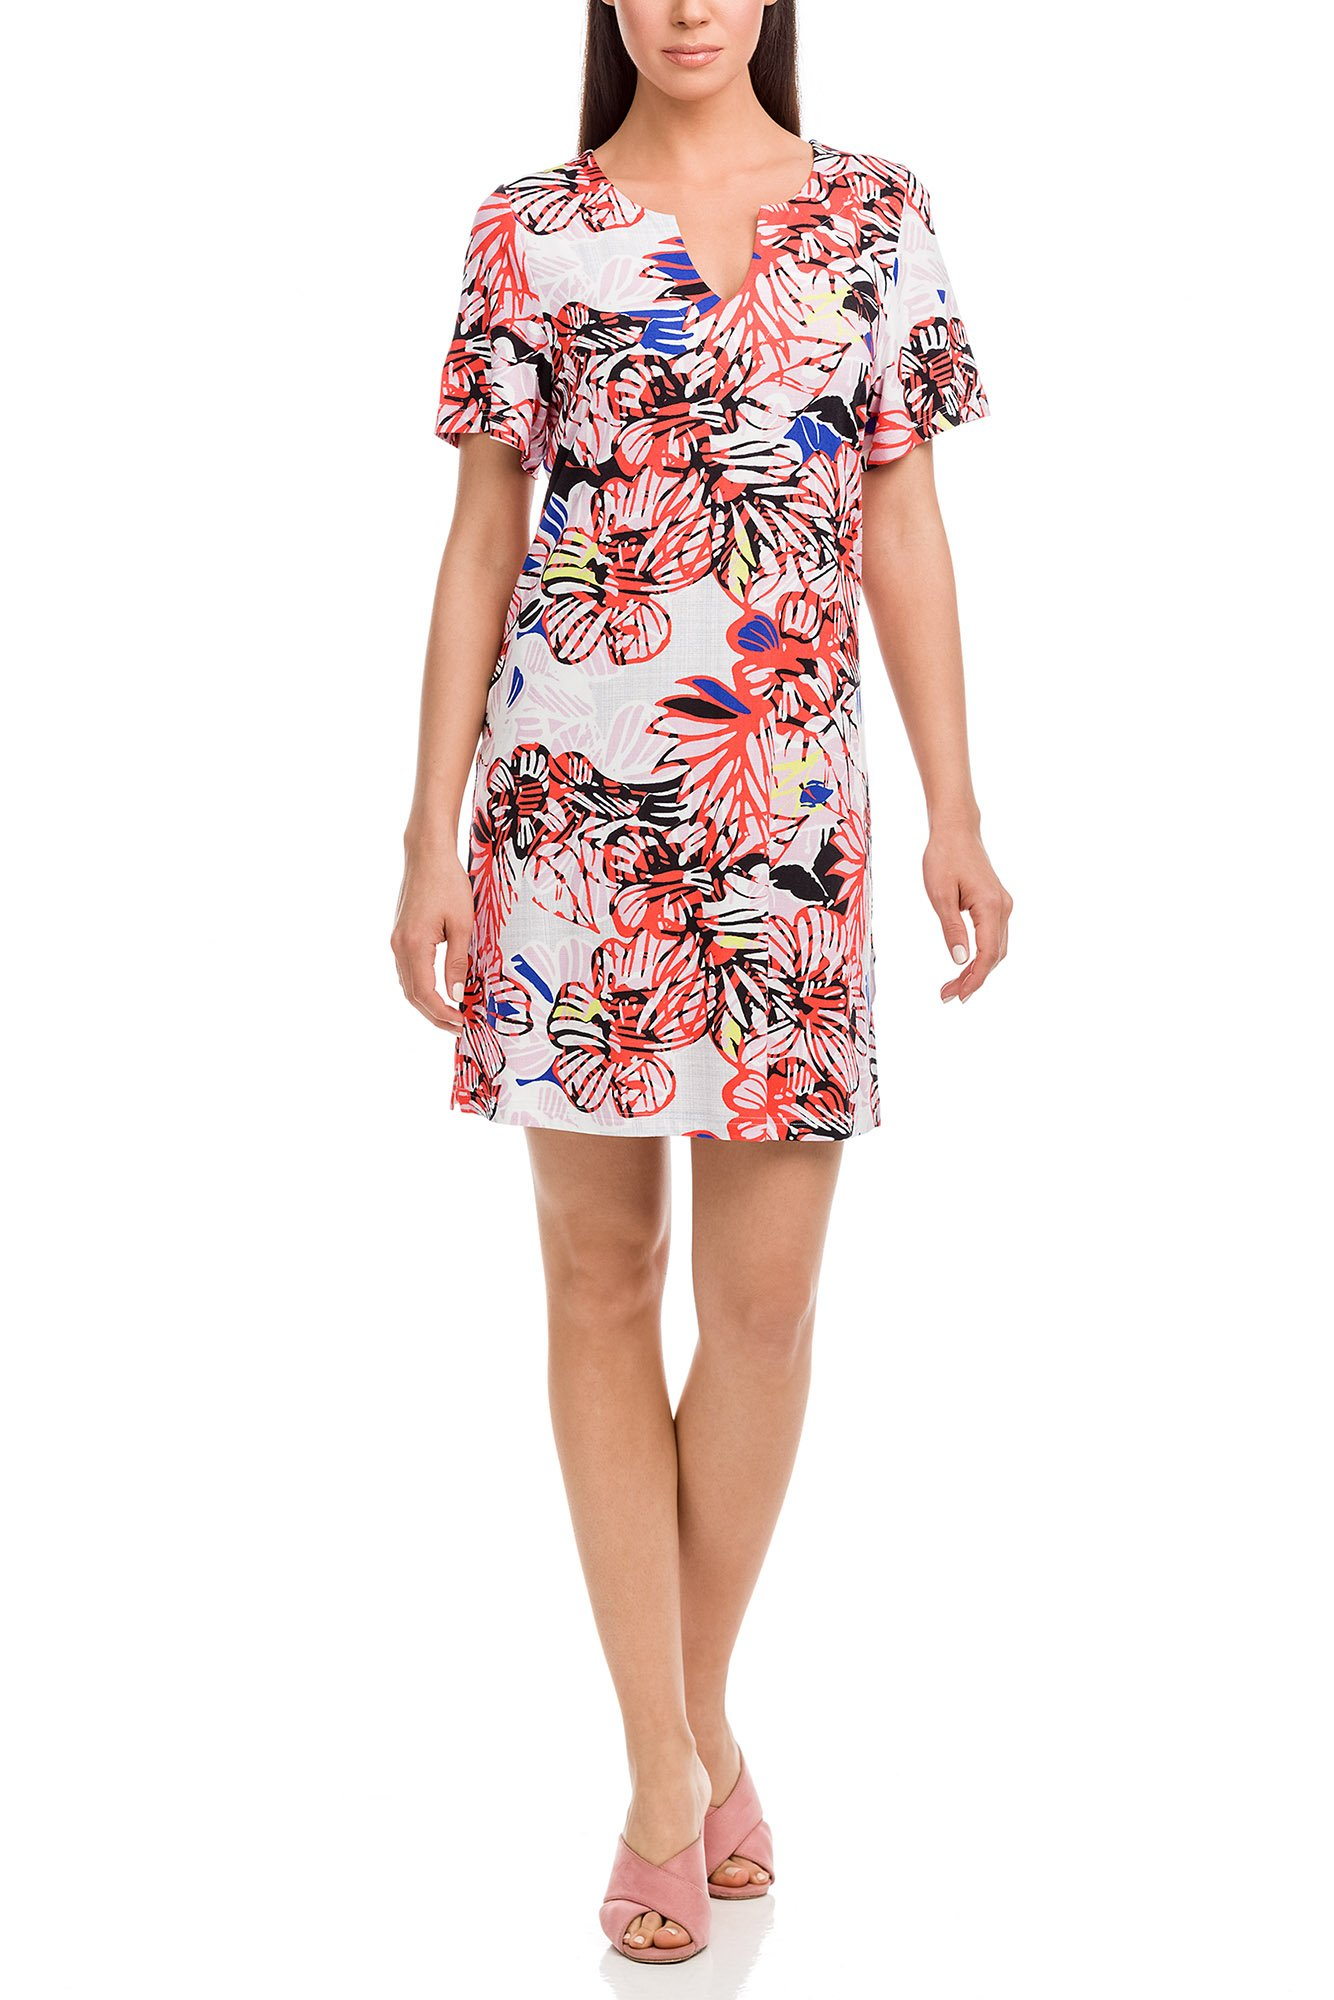 Vamp - Dámske šaty 12466 - Vamp coral xl